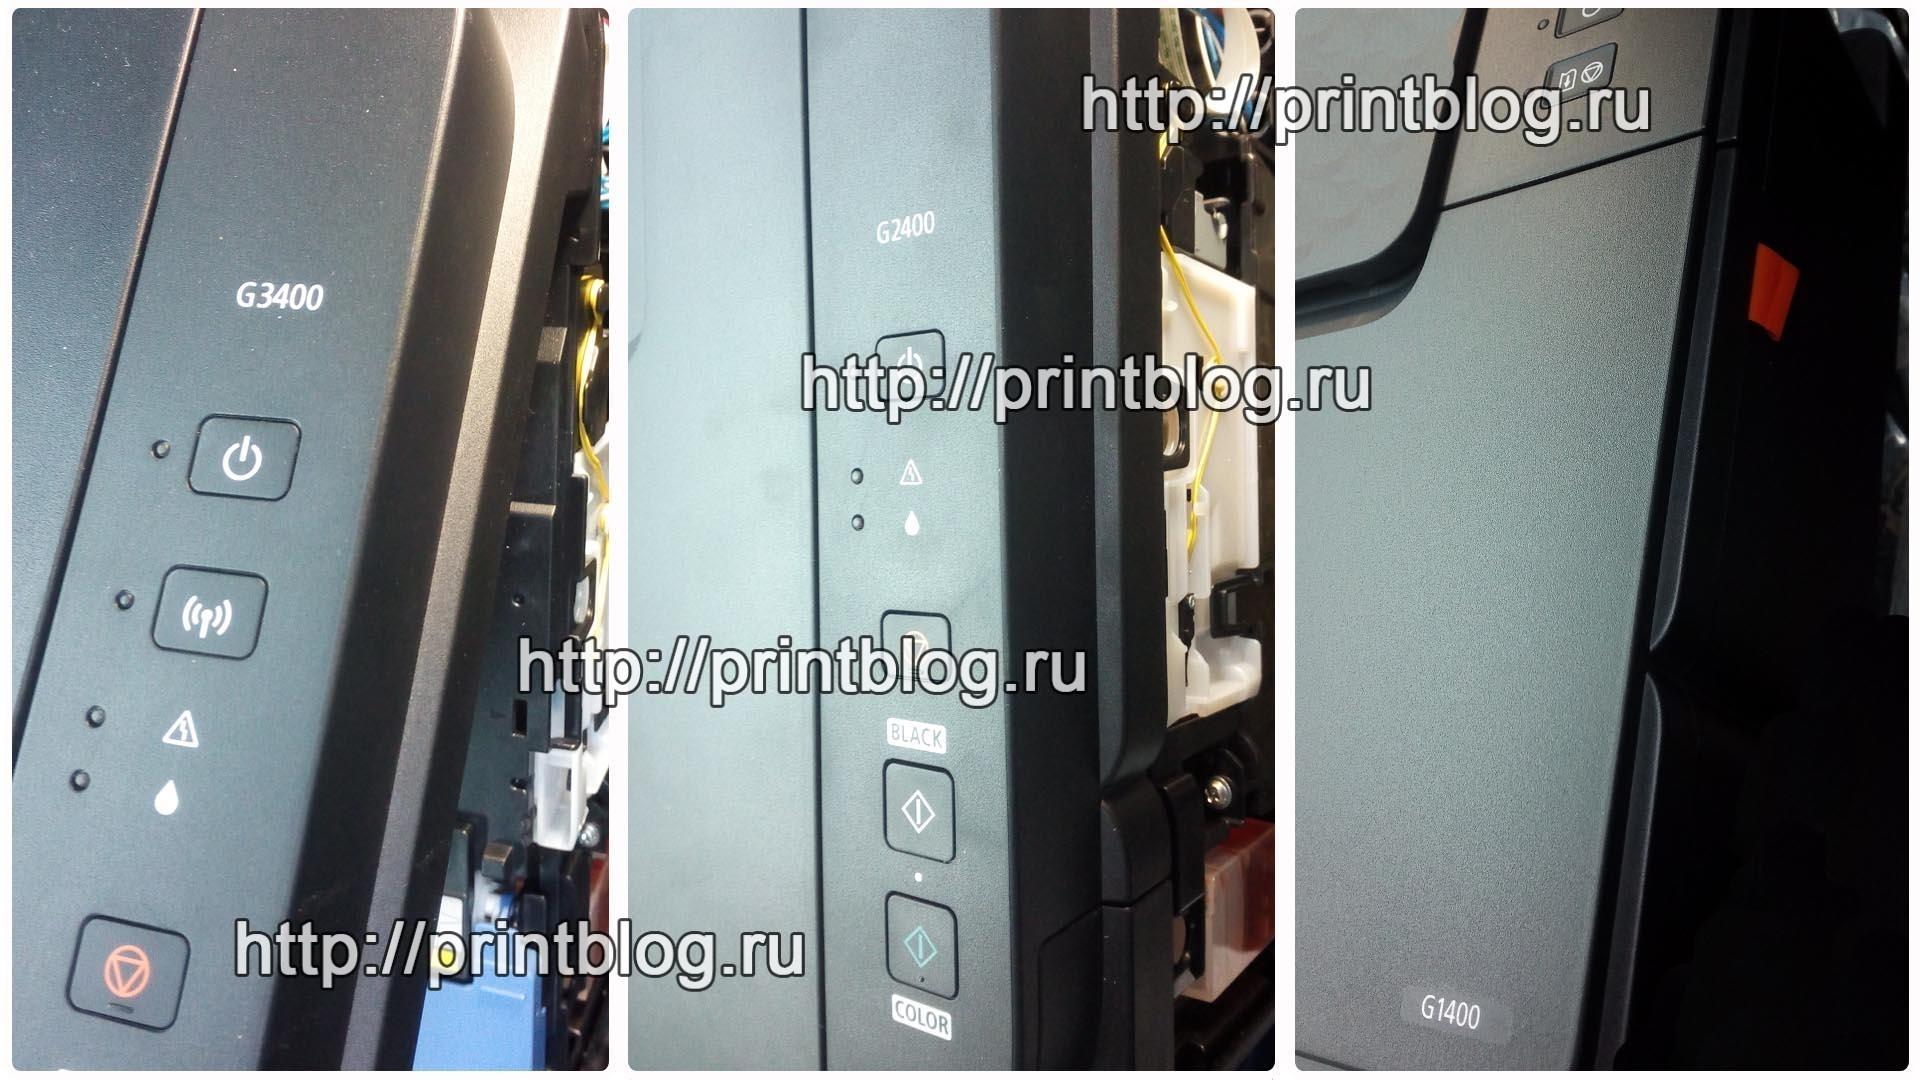 Canon PIXMA G3400, G2400, G1400 сброс ошибки 5B00 (памперс, отработка)